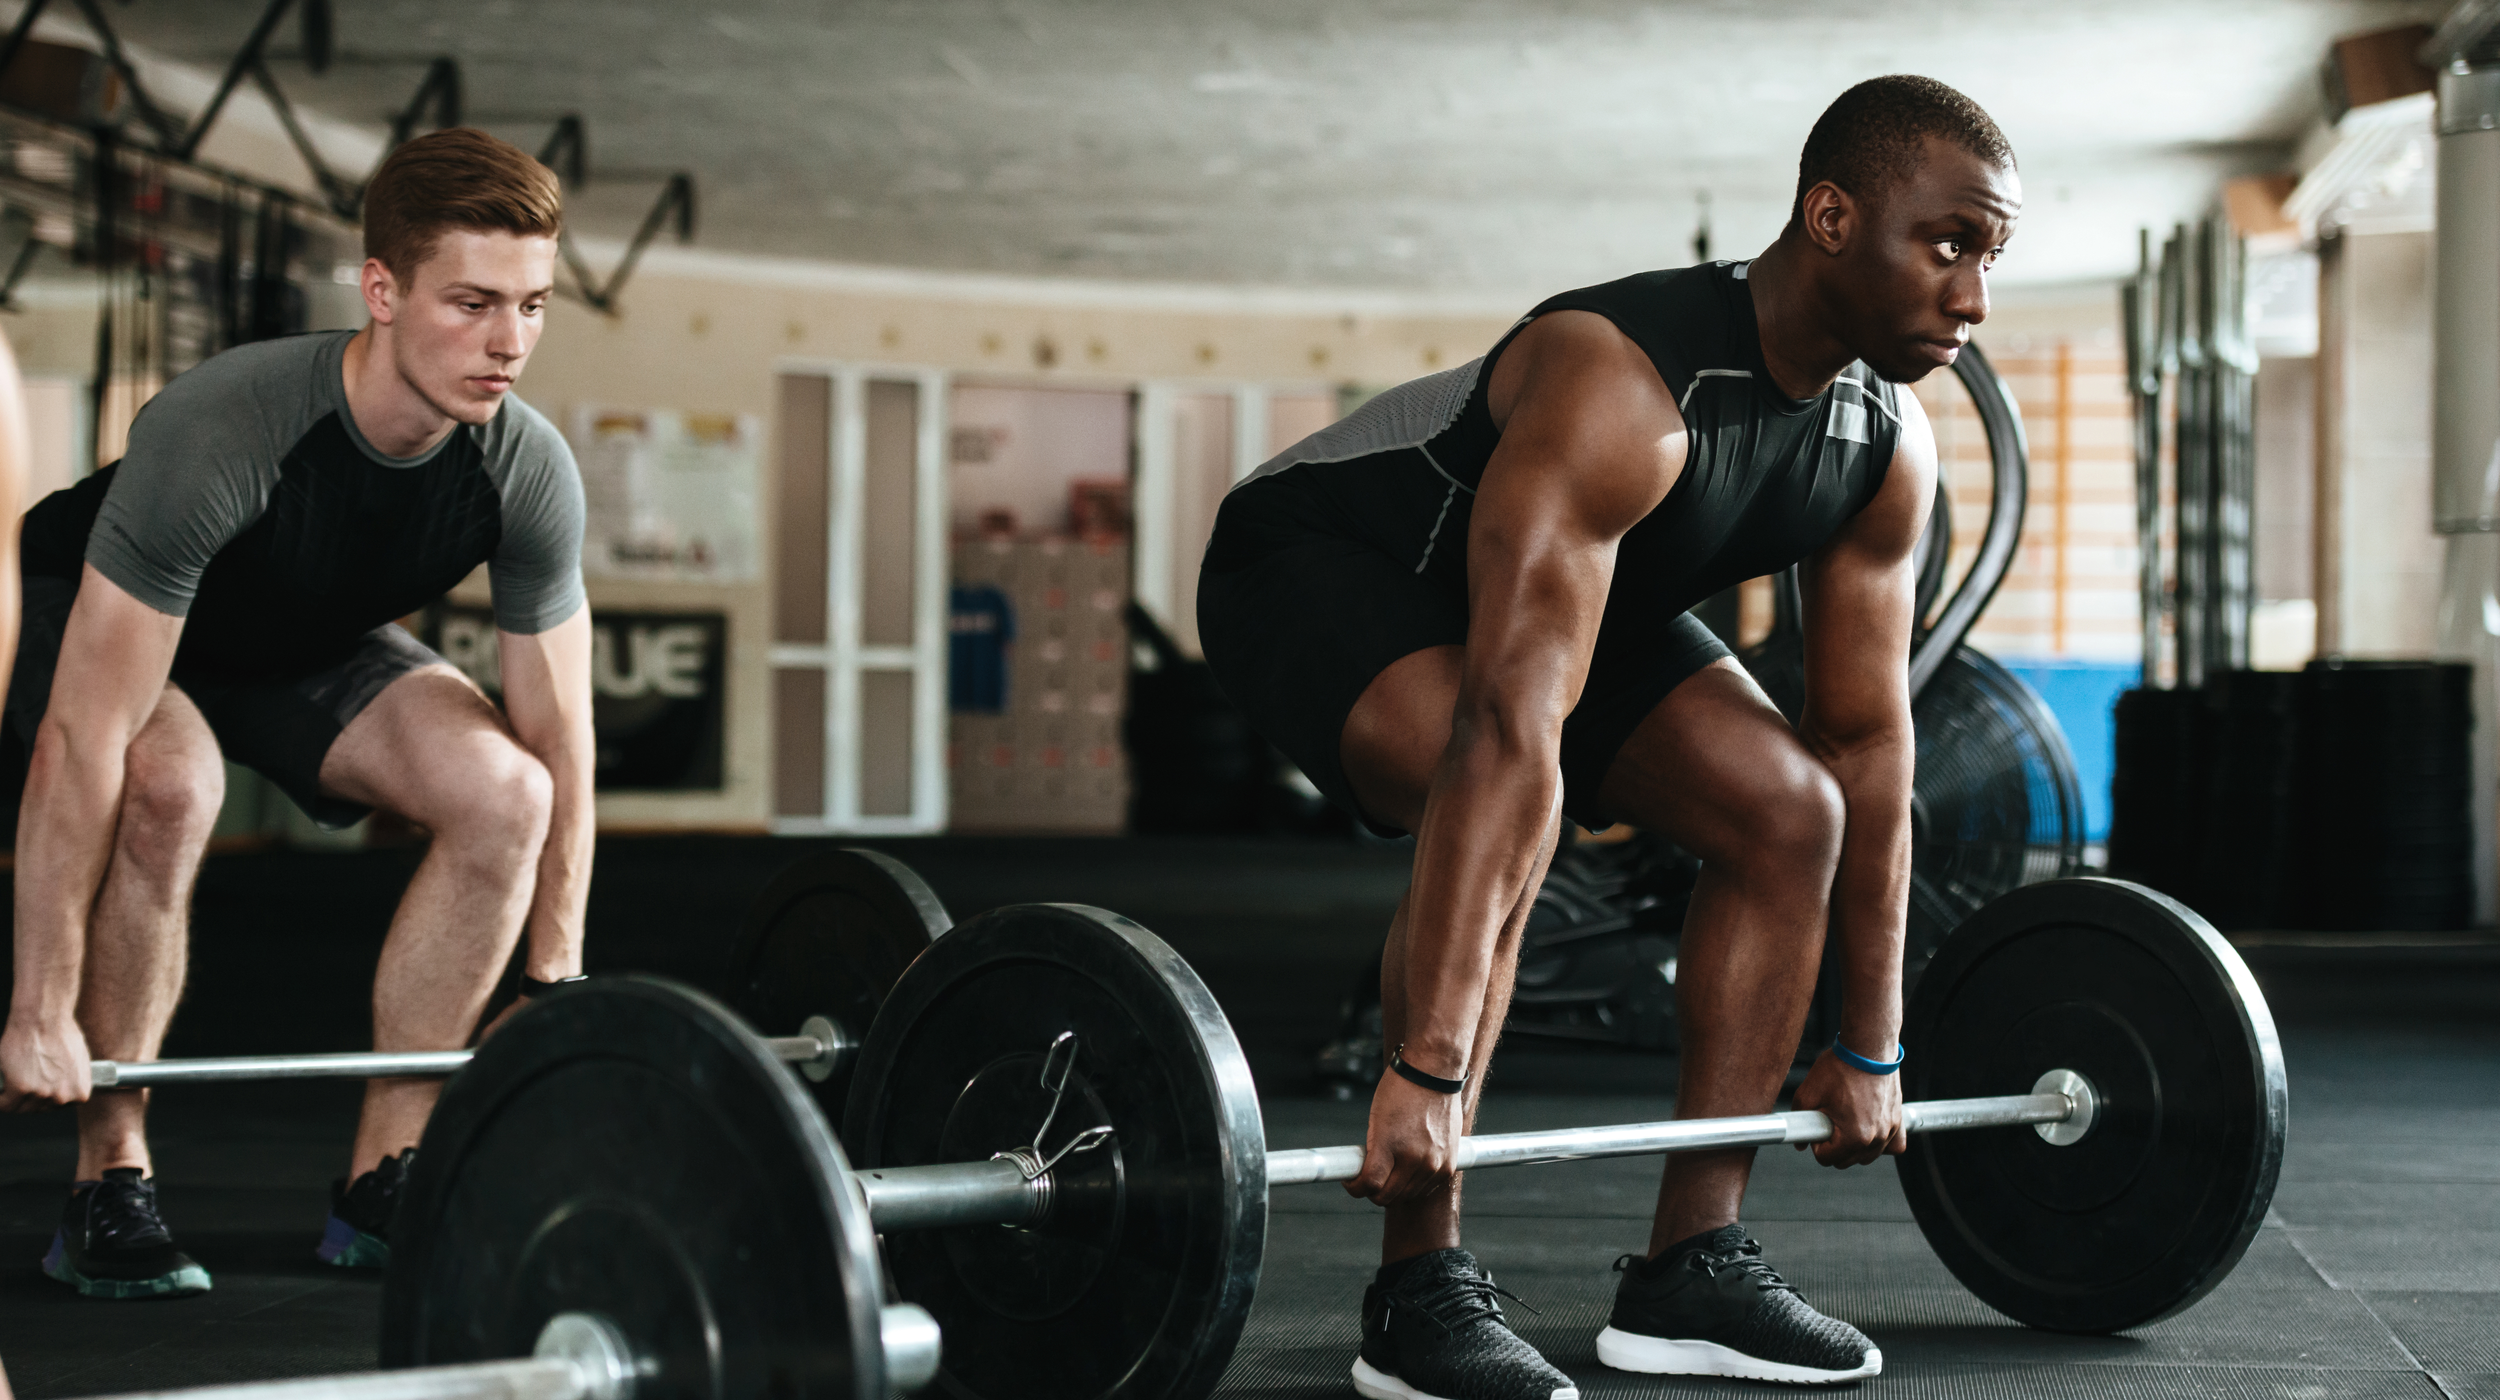 4 POWERFUL Skinny Guy Muscle Growing Tips